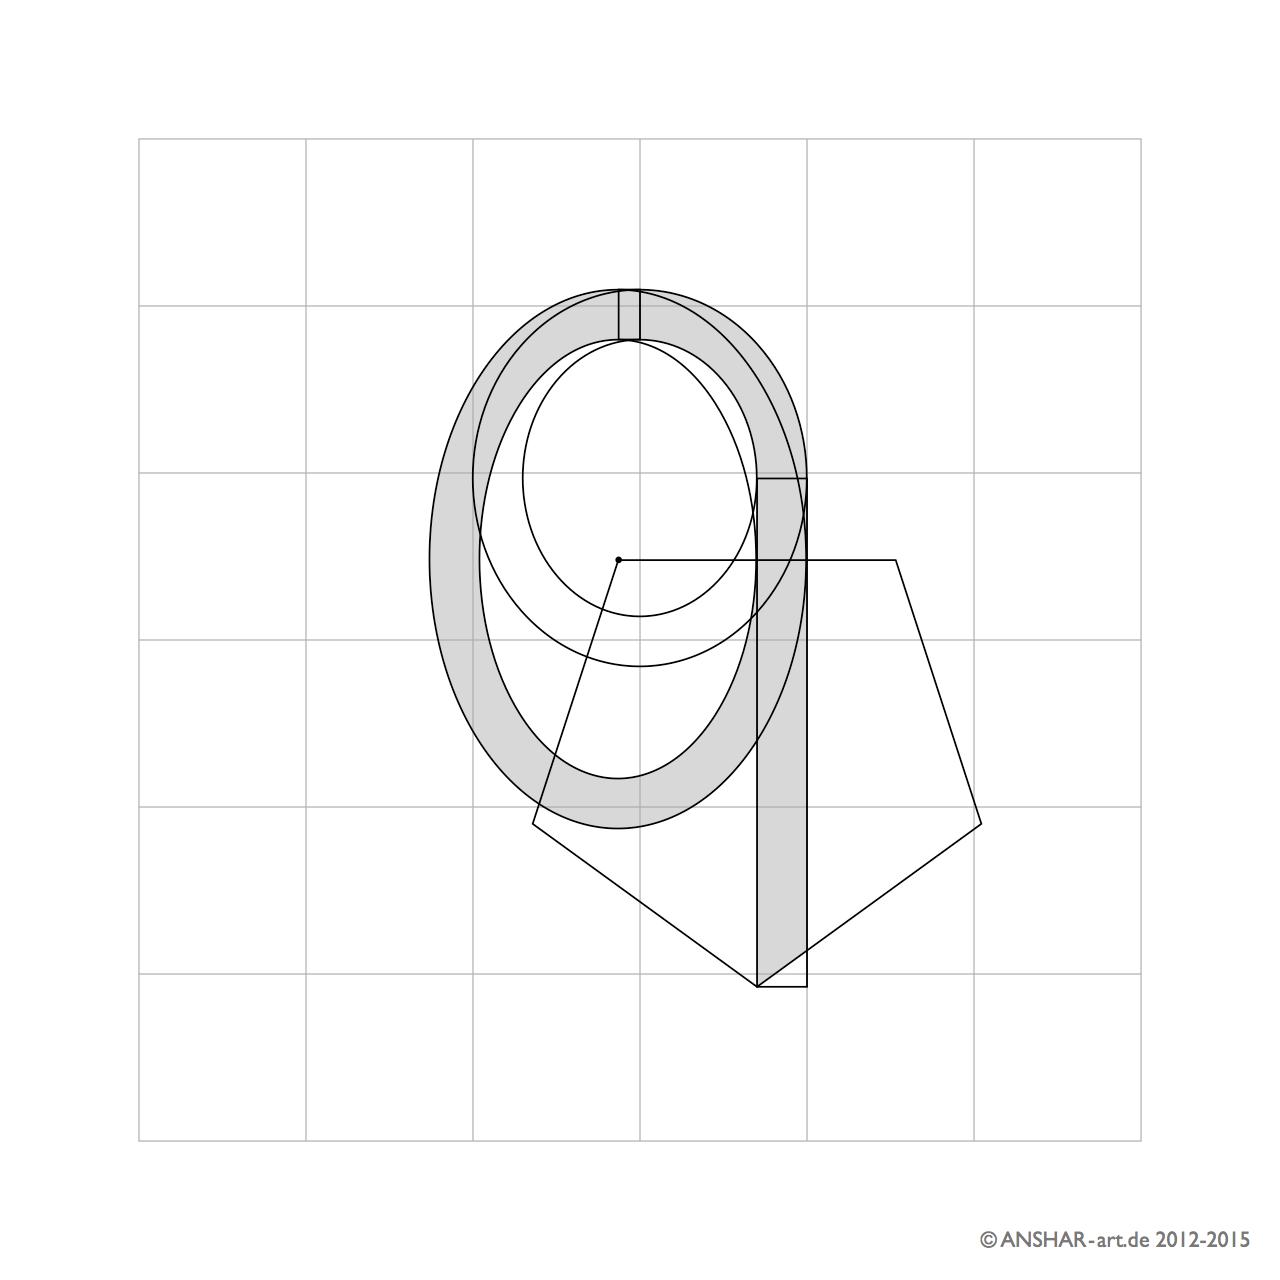 Q = 80